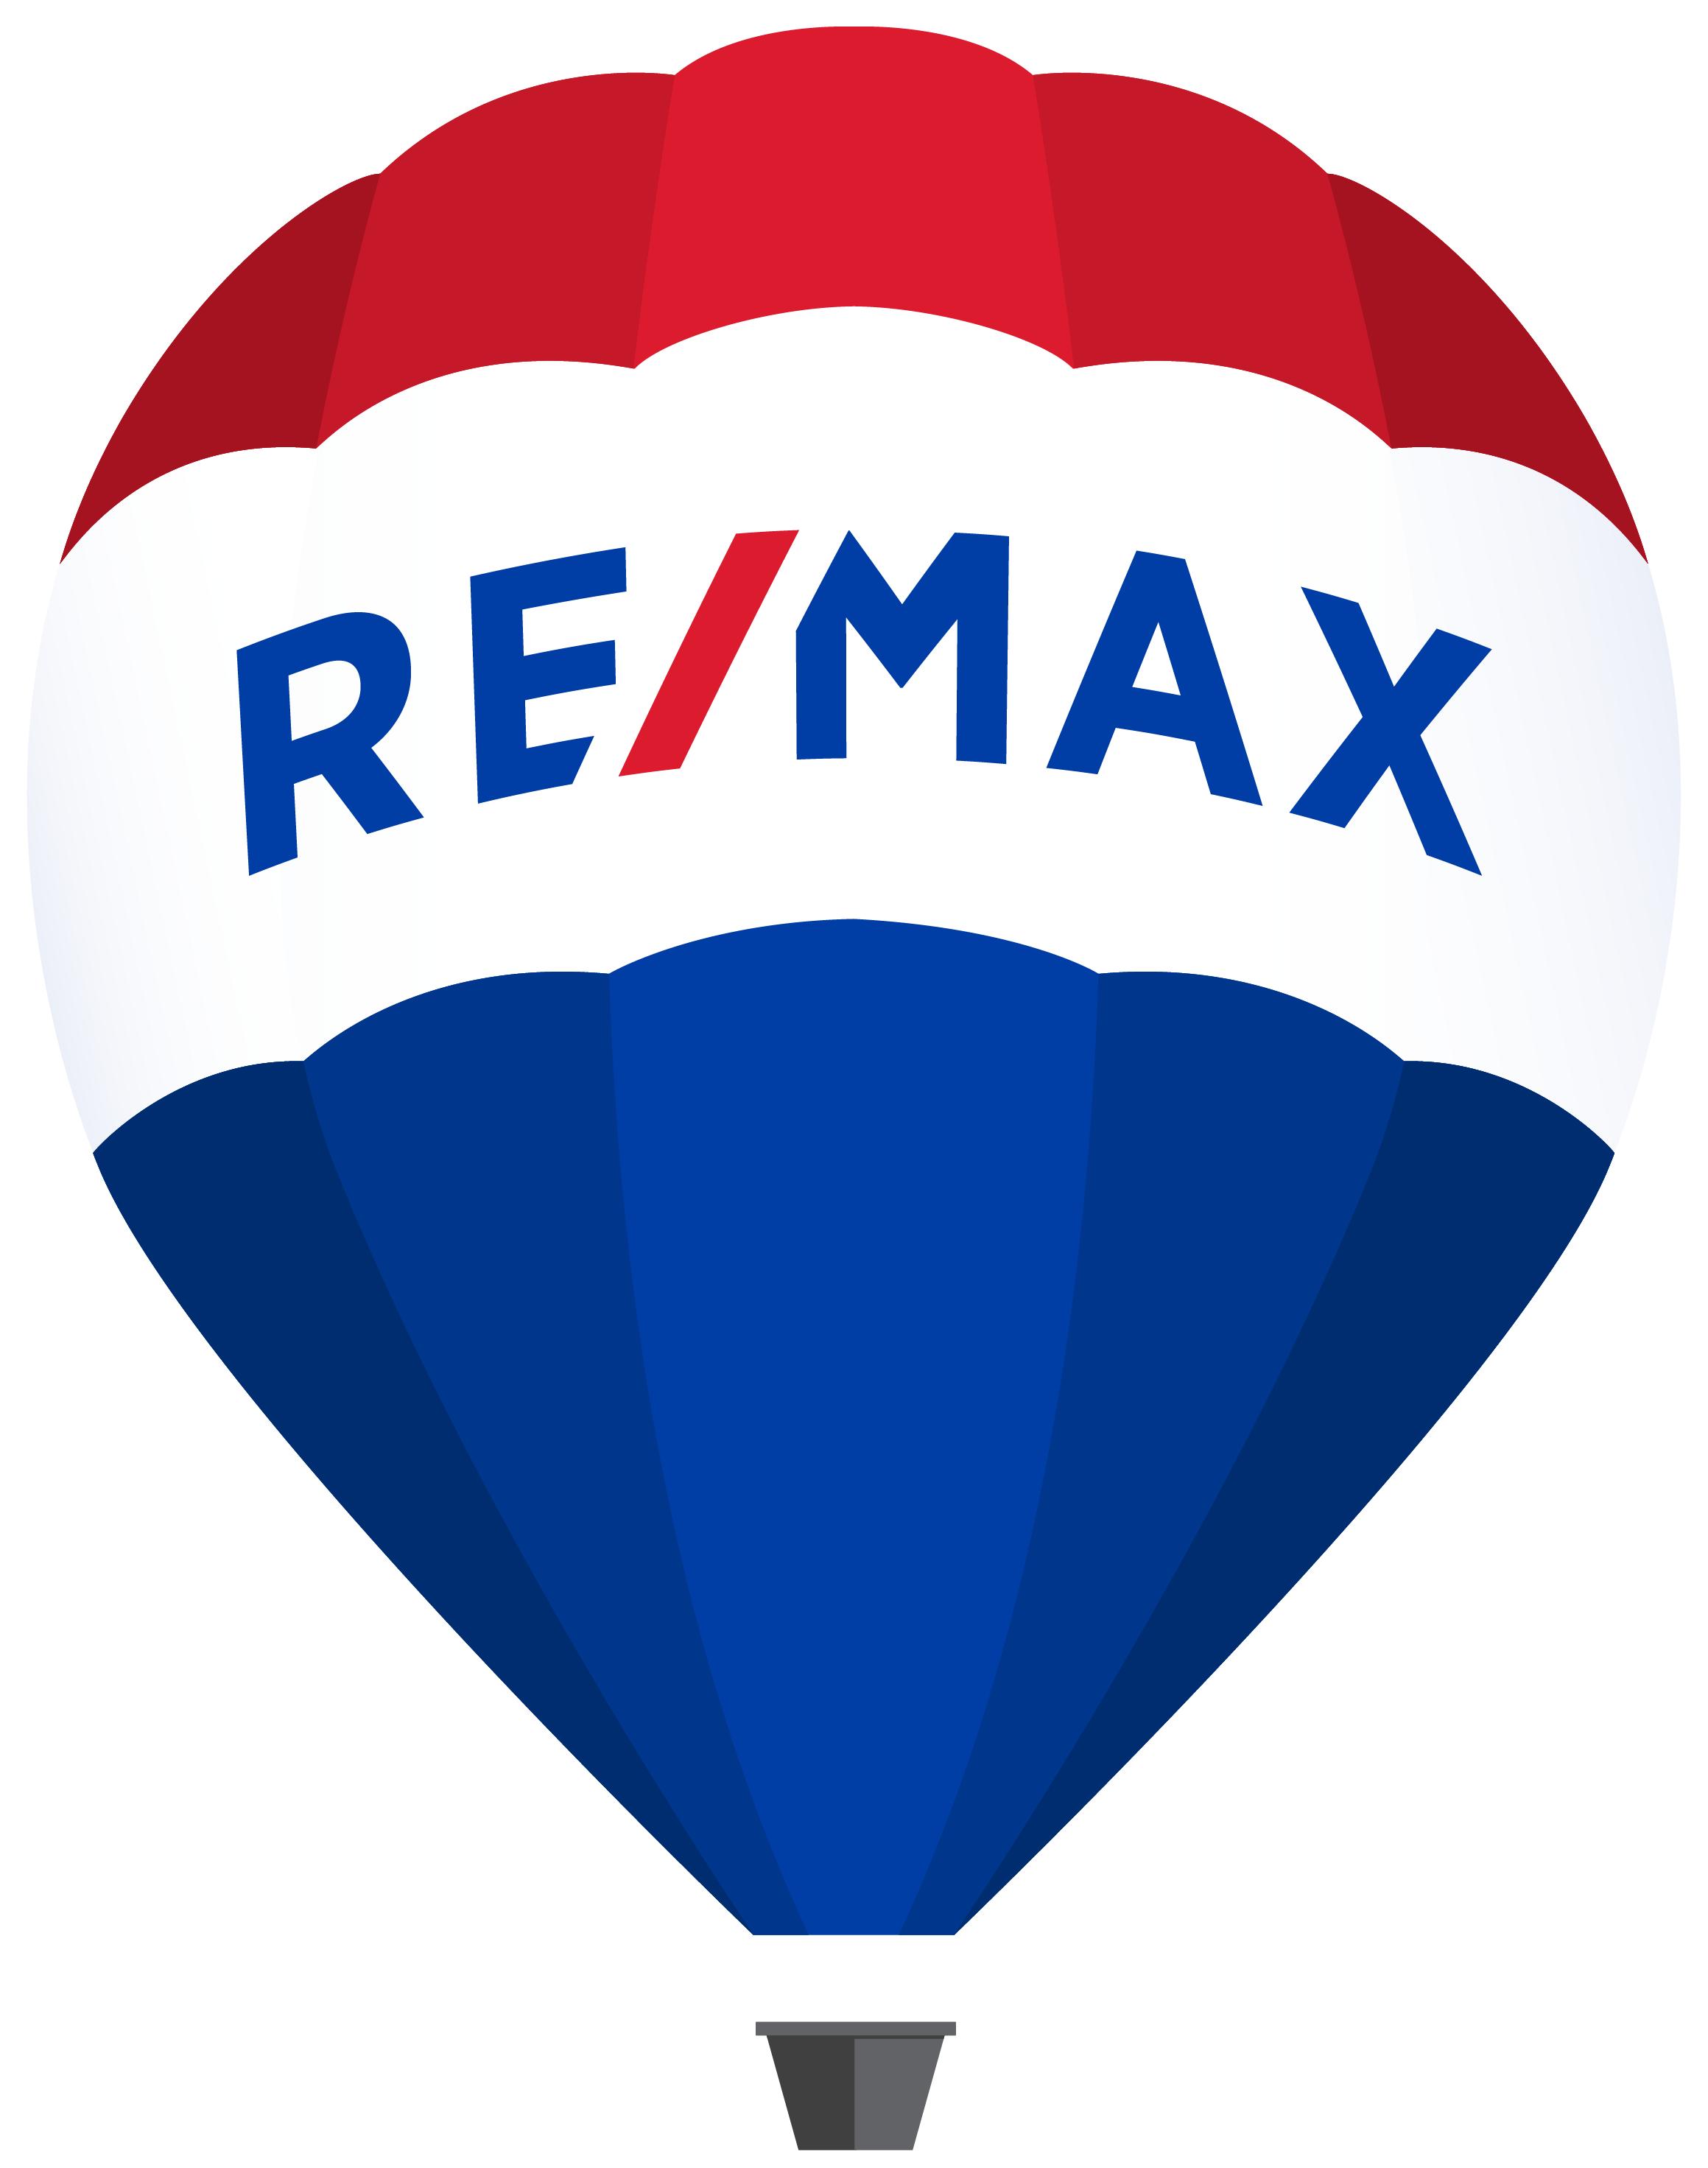 1-REMAX_Balloon_RGB.png